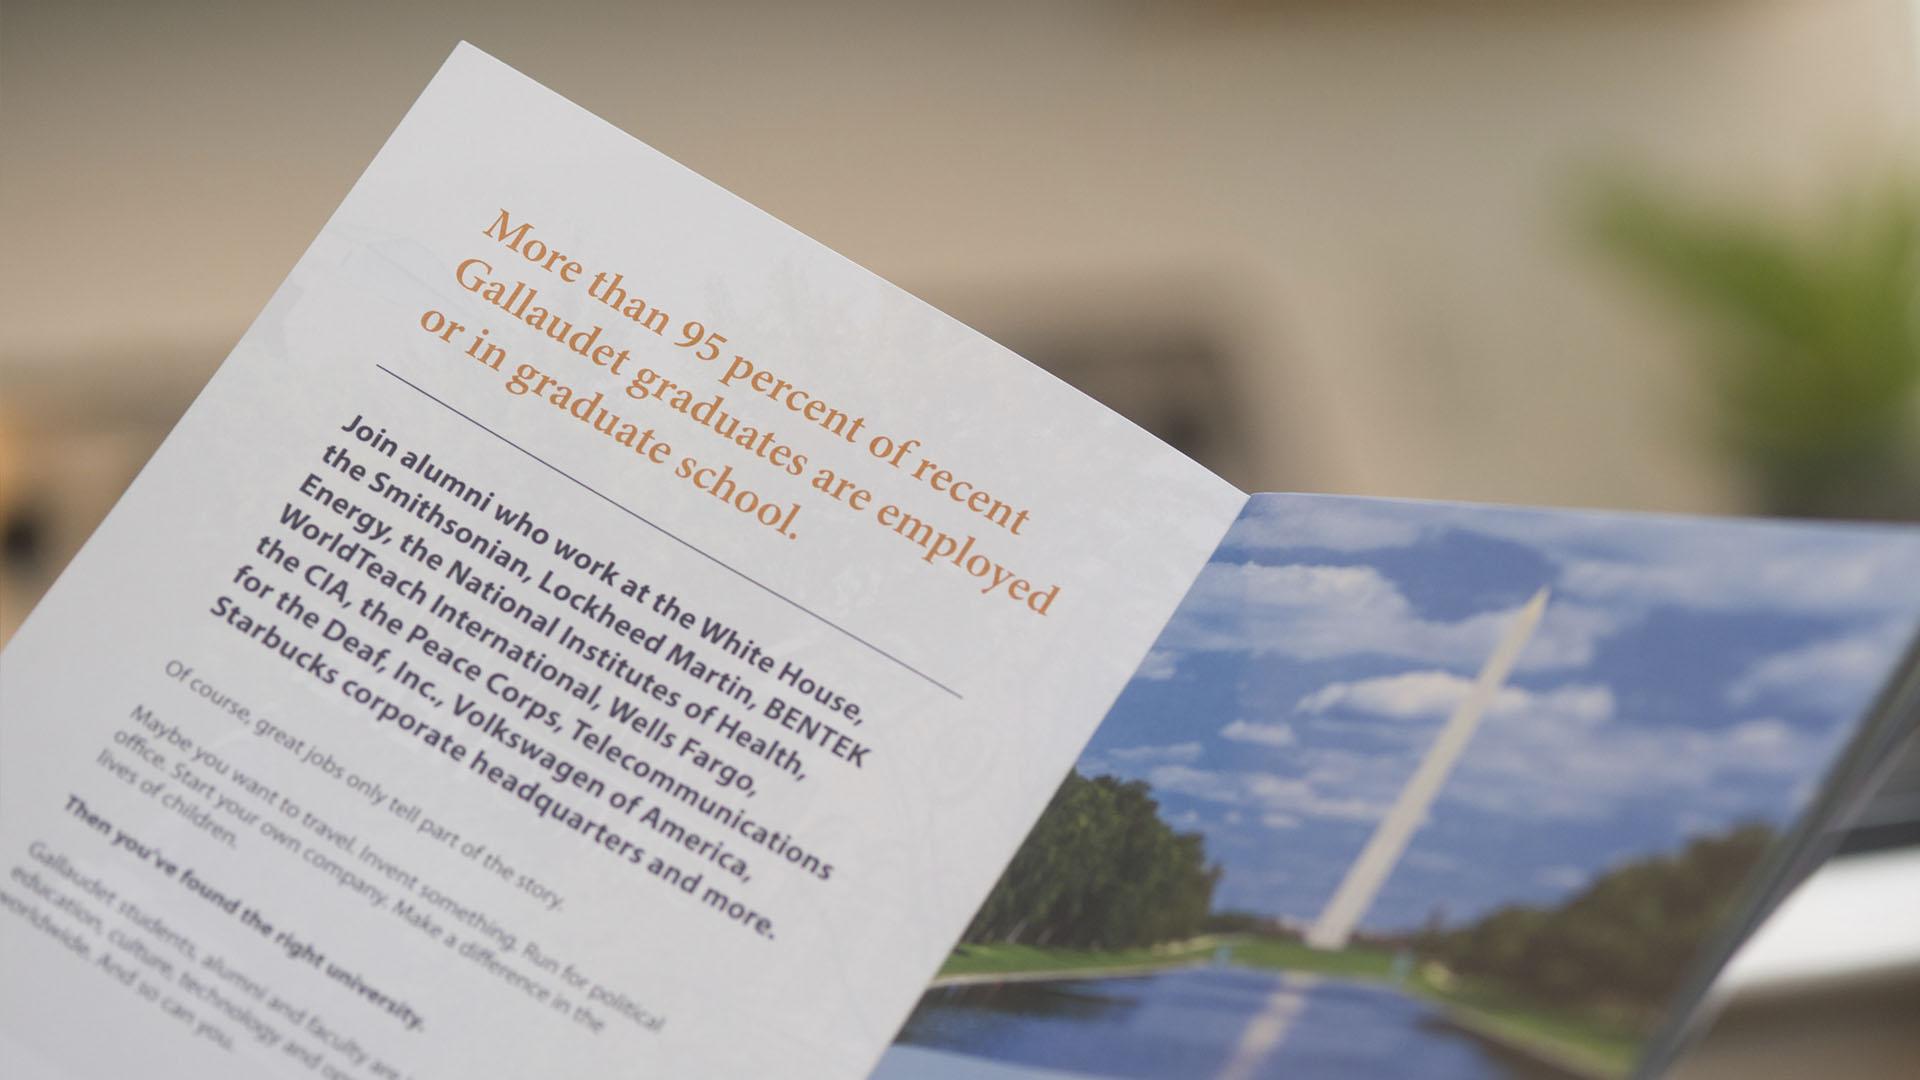 Gallaudet-University-Branding-Marketing-Admissions-Viewbook_08.jpg